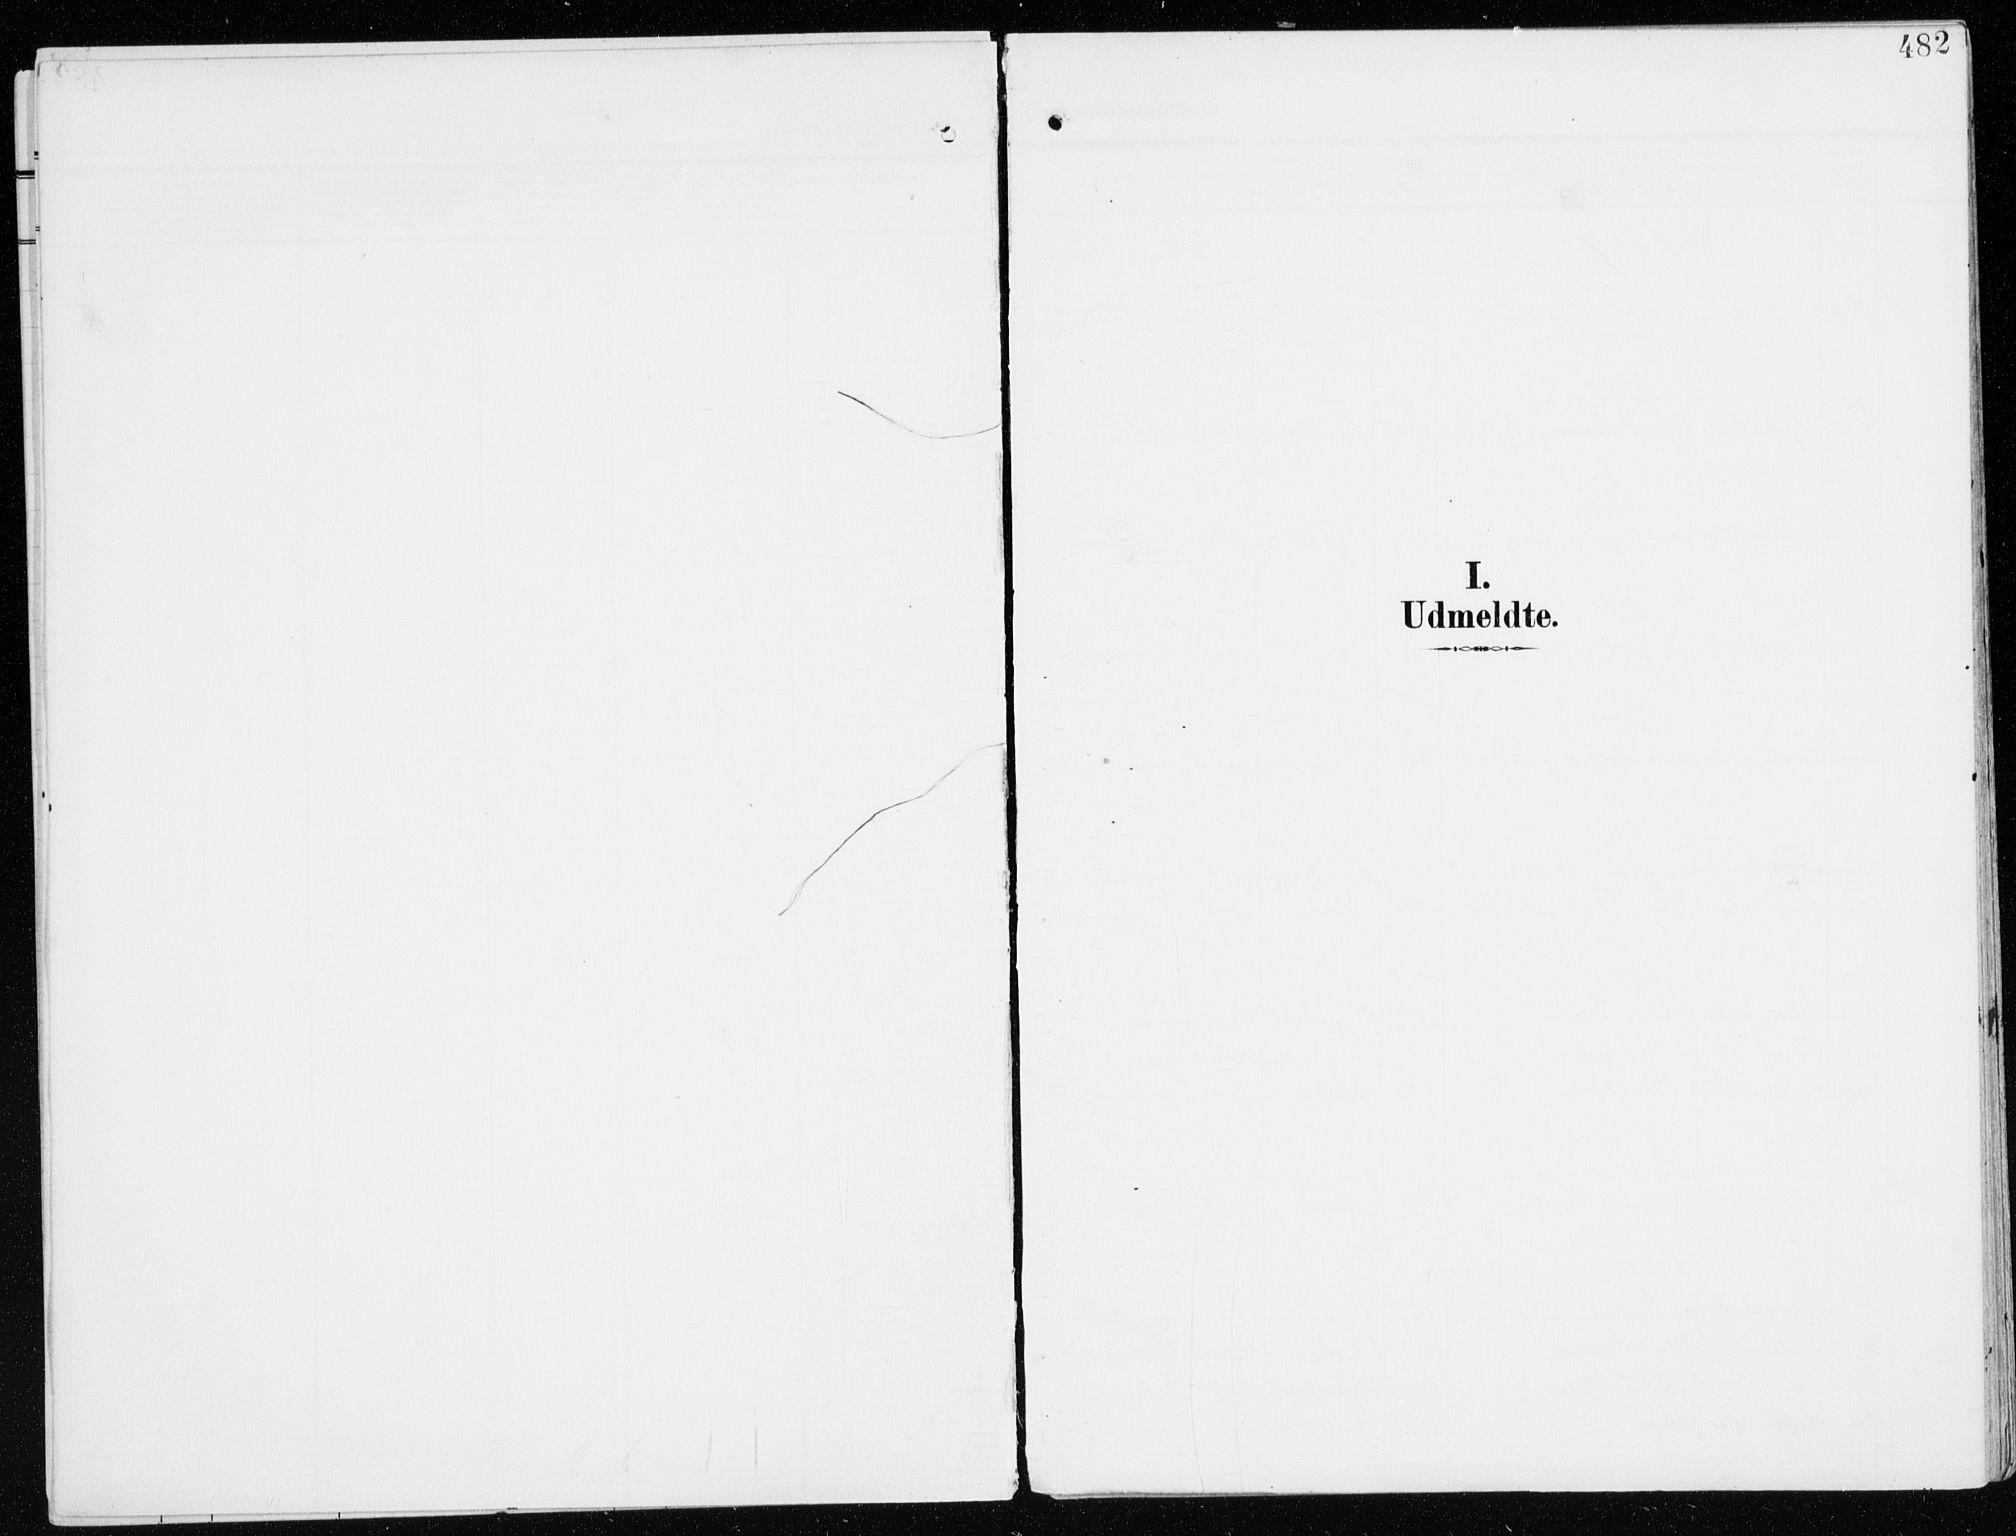 SAH, Furnes prestekontor, K/Ka/L0001: Parish register (official) no. 1, 1907-1935, p. 482